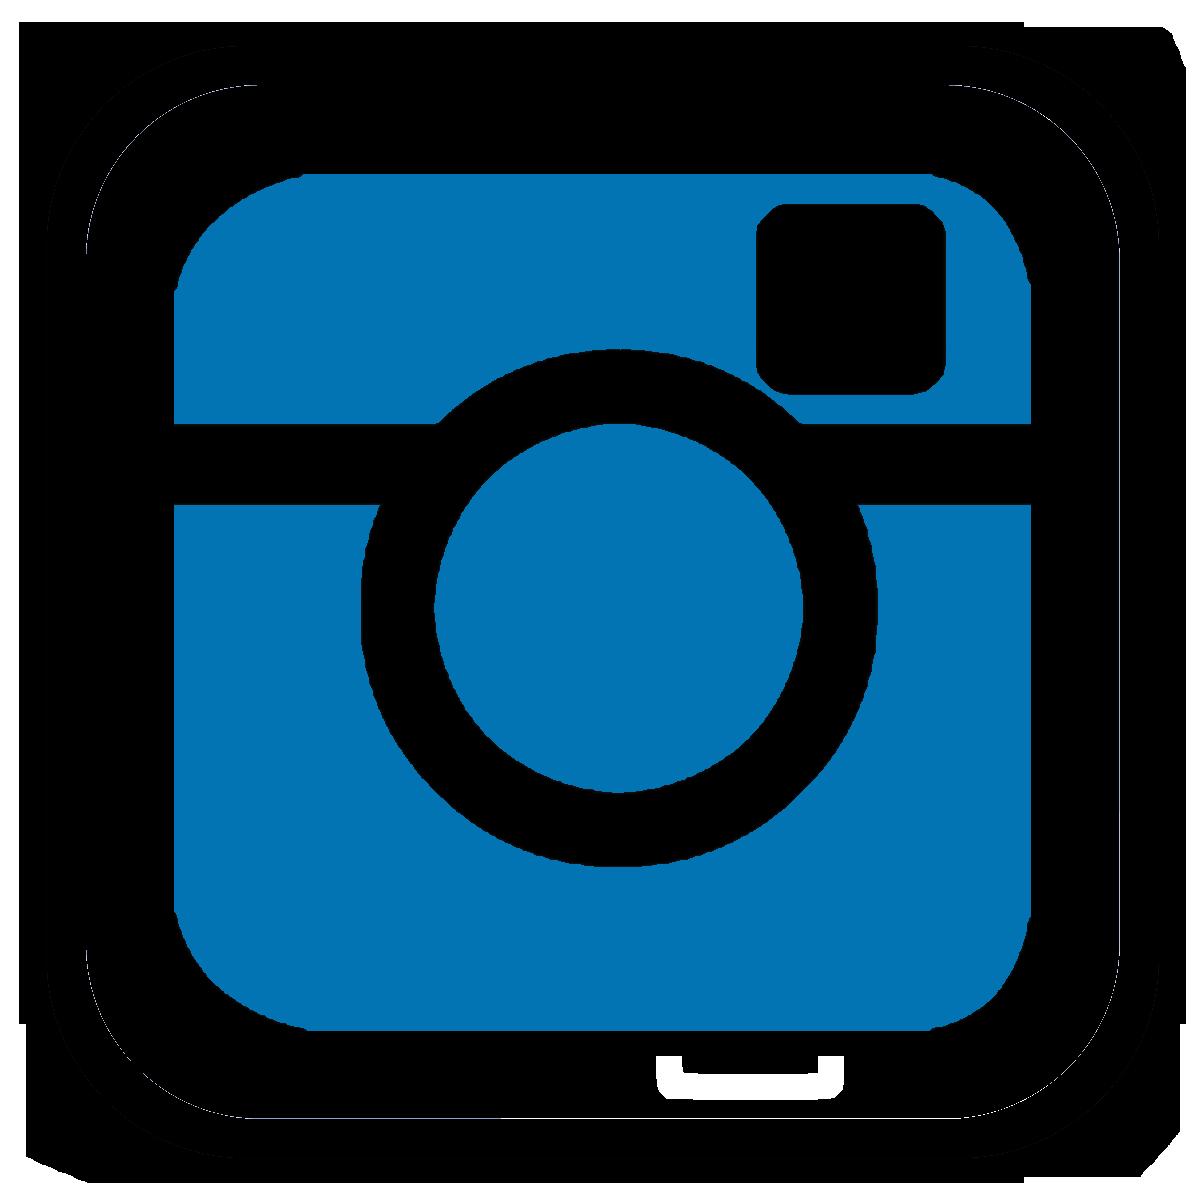 Instagram logo clipart free clip art royalty free Instagram Logo Transparent clipart free image clip art royalty free